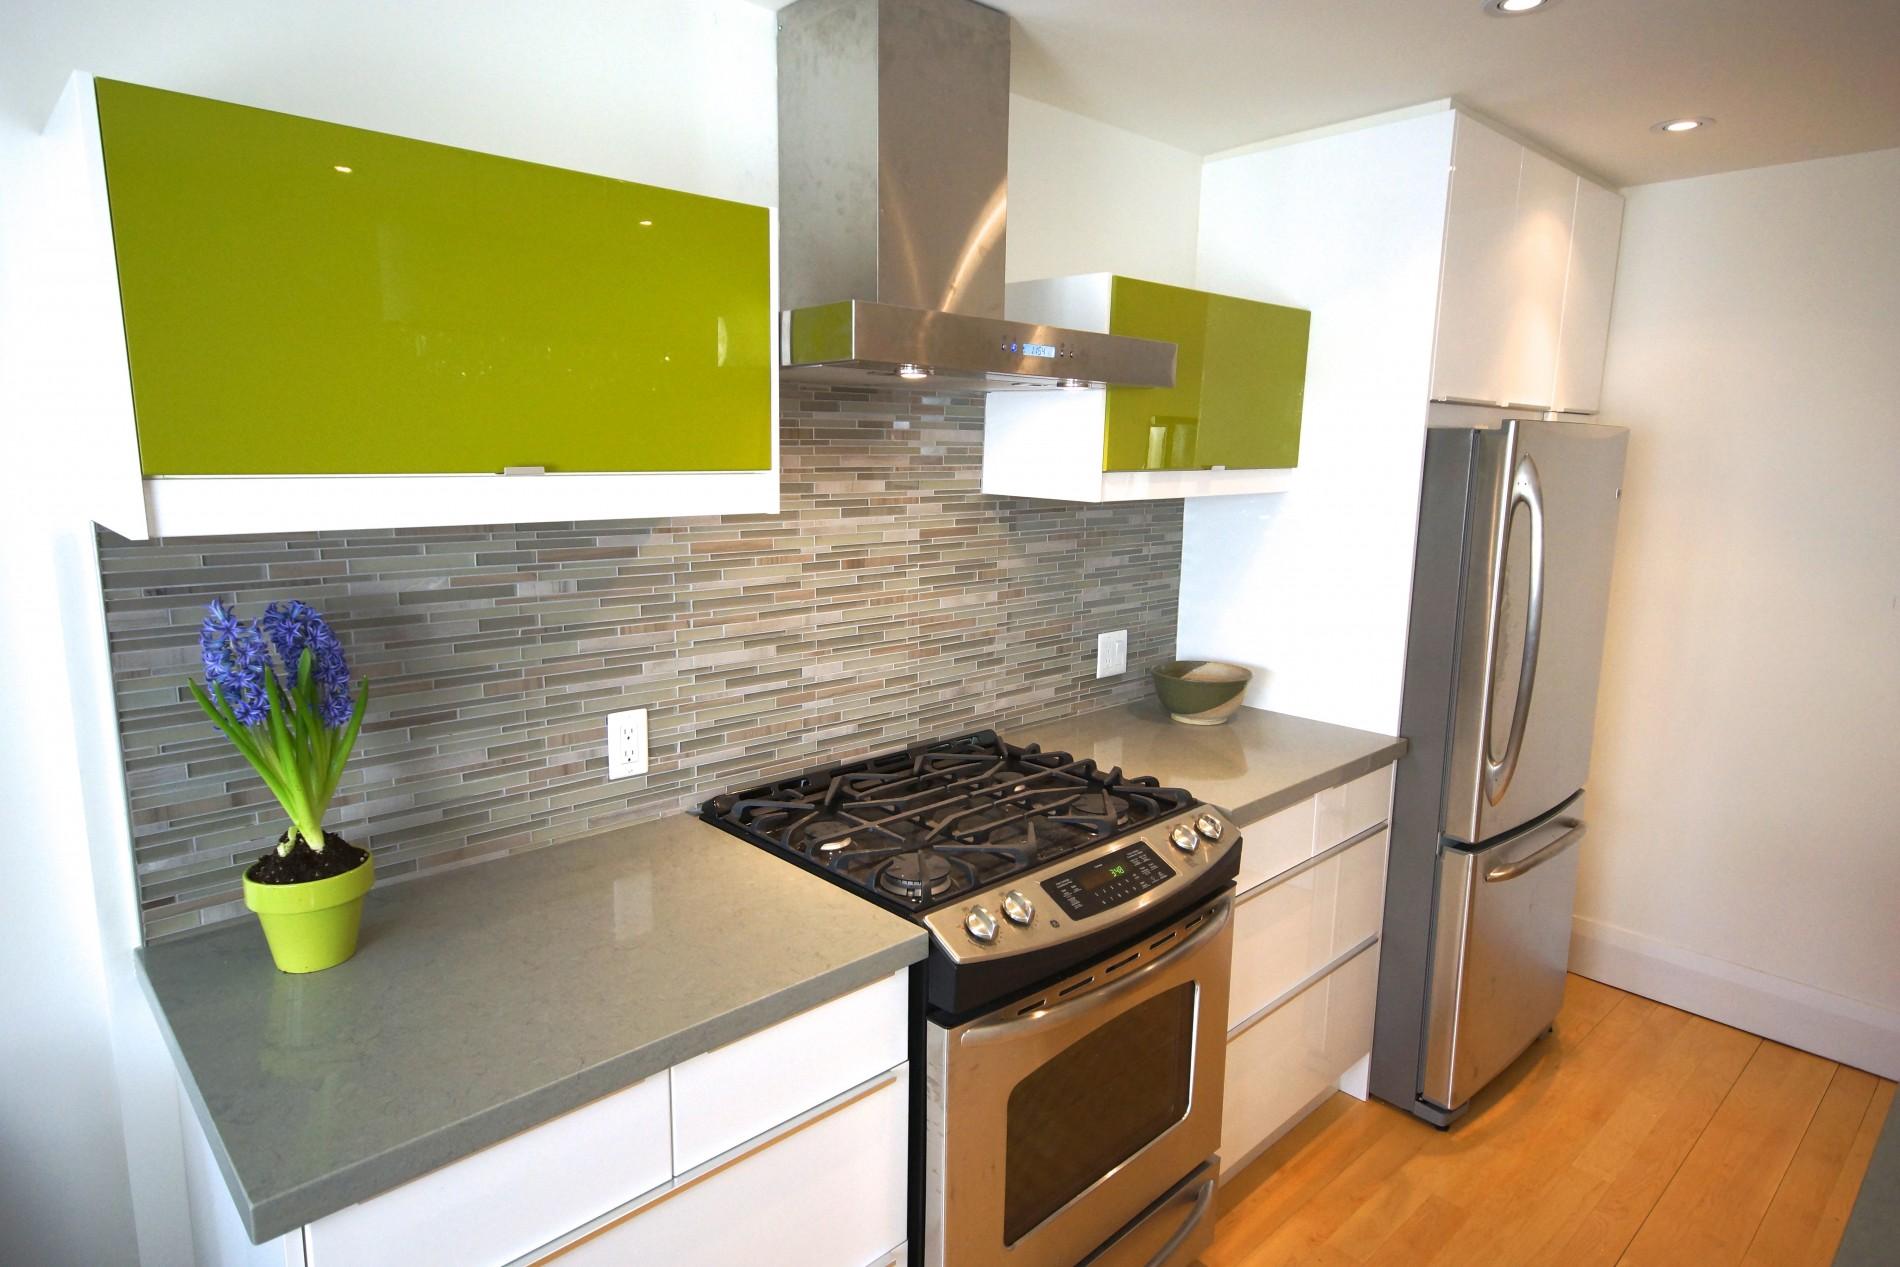 Leslieville Modern Kitchen - Featured Image